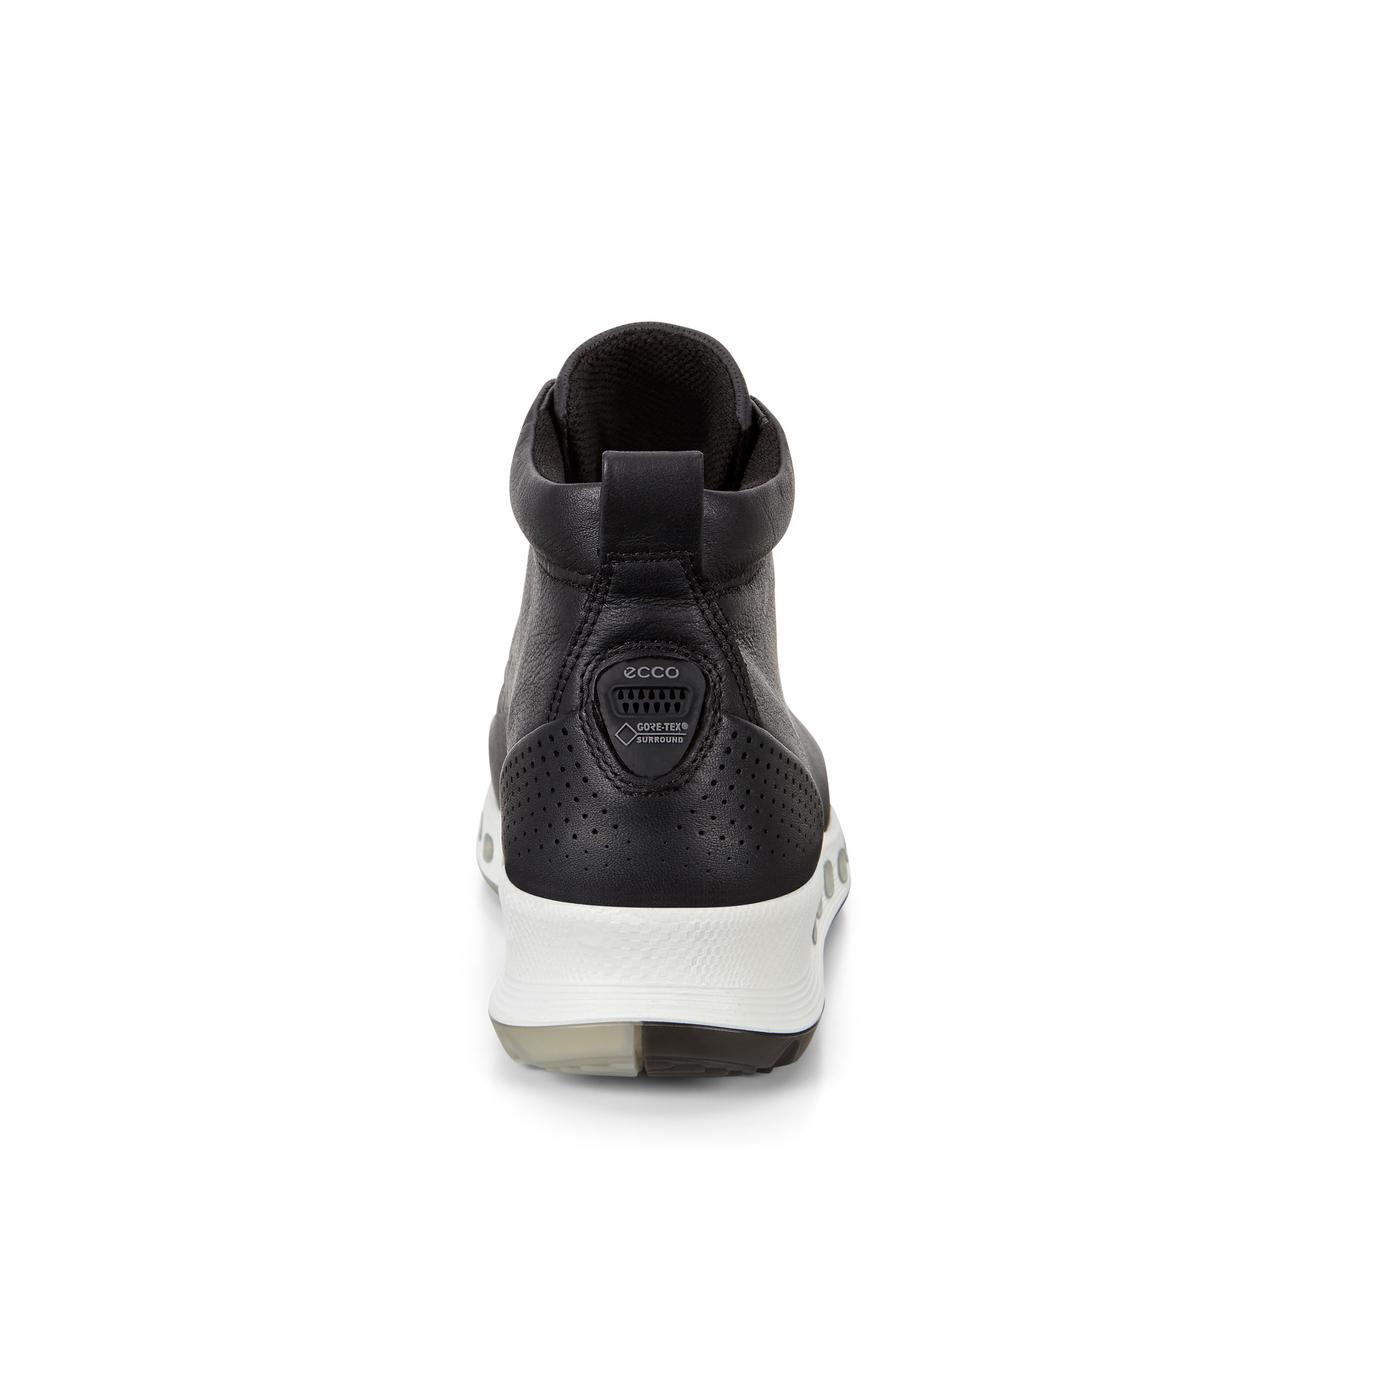 ECCO COOL2.0 Womens High Cut Sneaker